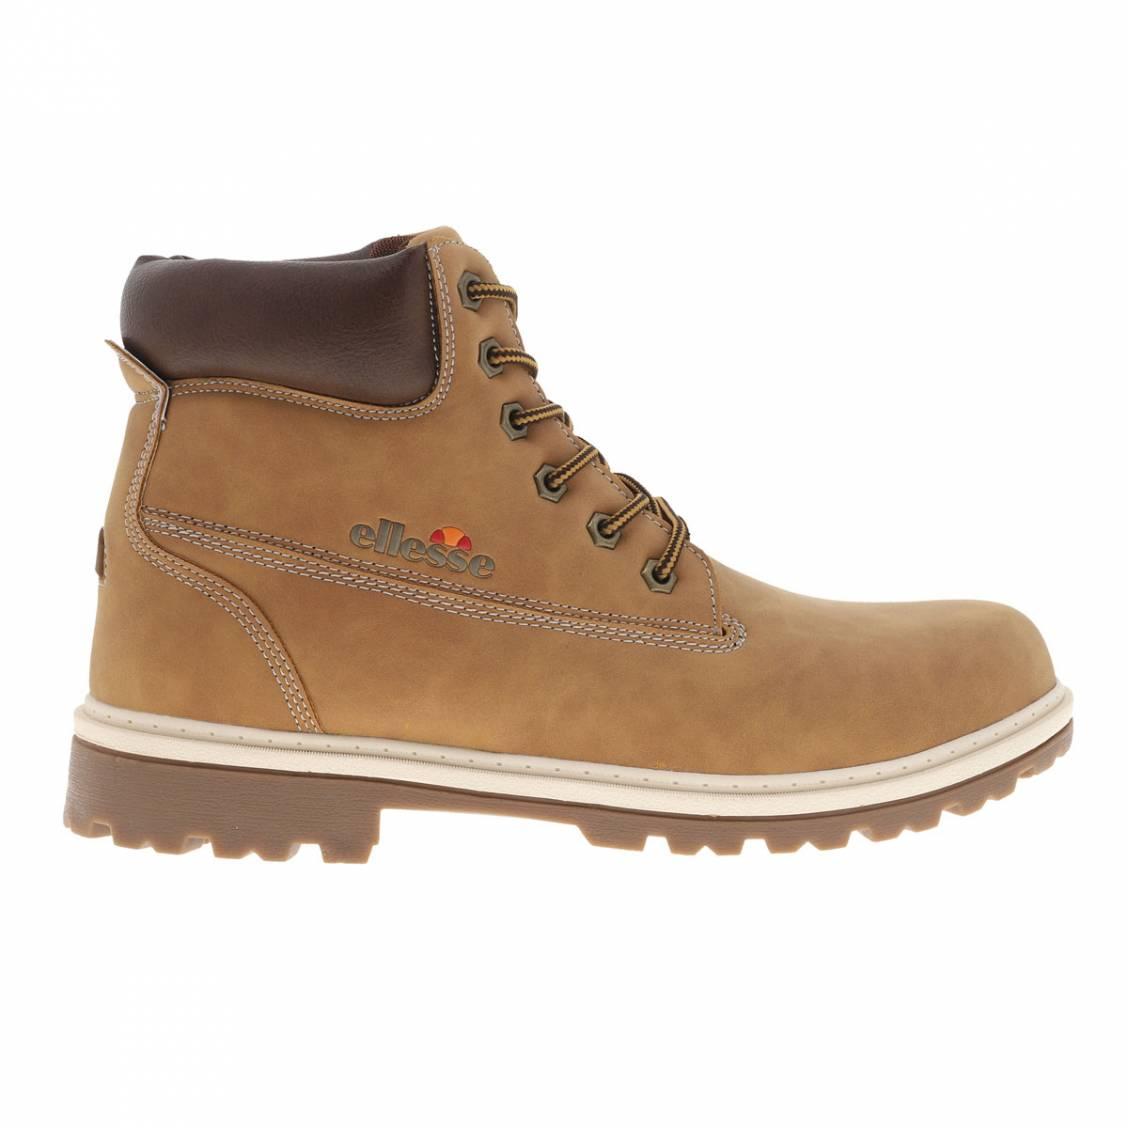 cd57ab9ebdd Boots hautes Ellesse Prime marron ...